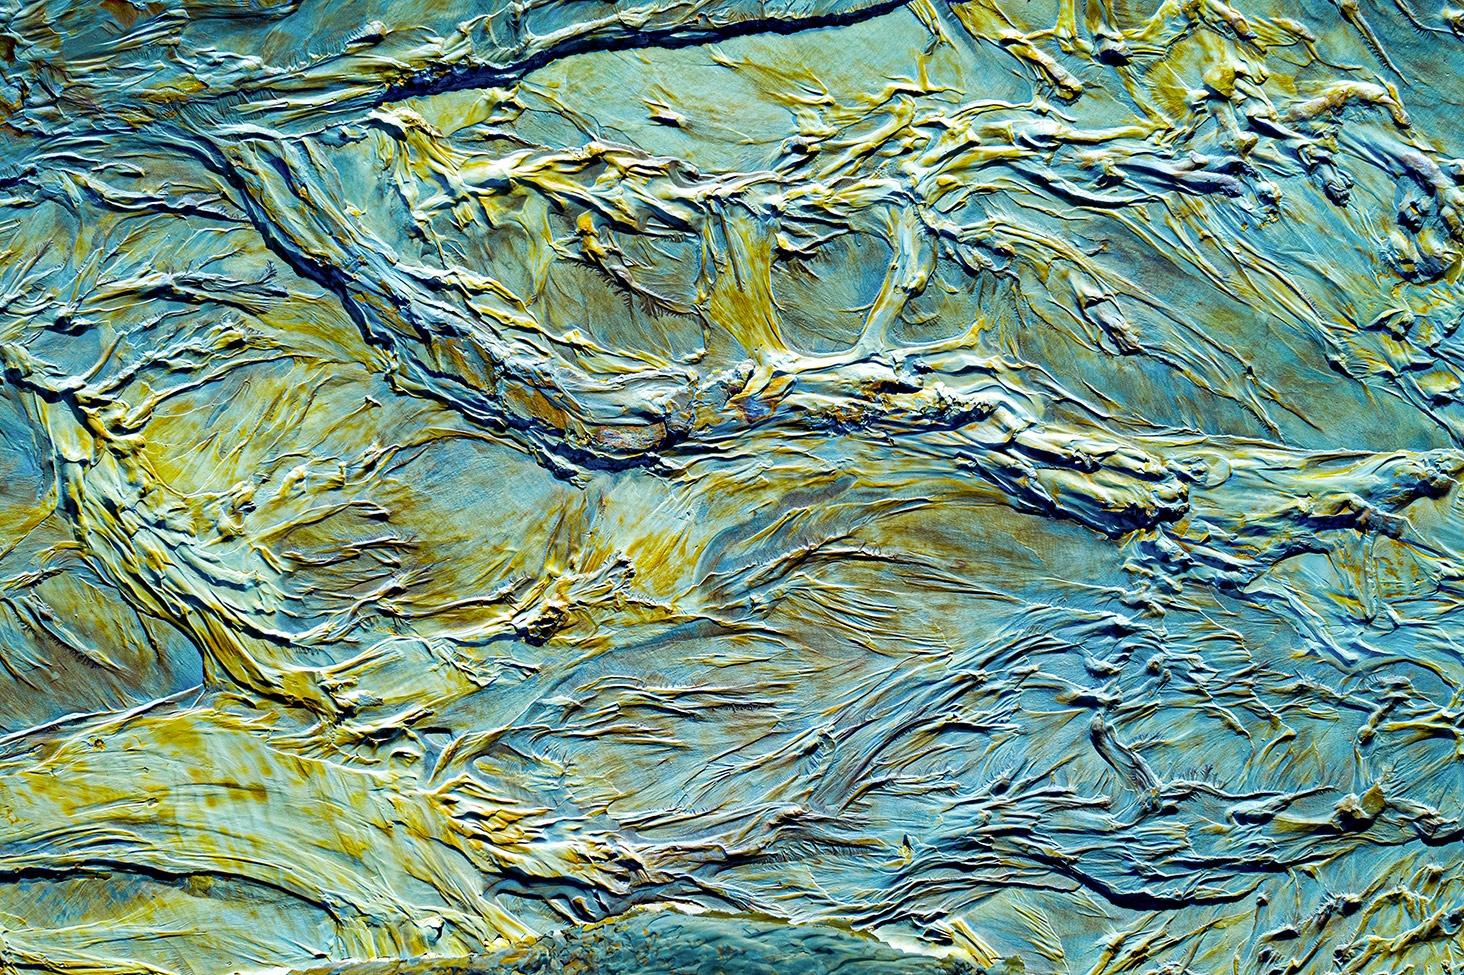 Oil Painting Details - Ignacio Medem - Portfolio Natural, Fotografía de Naturaleza de Autor